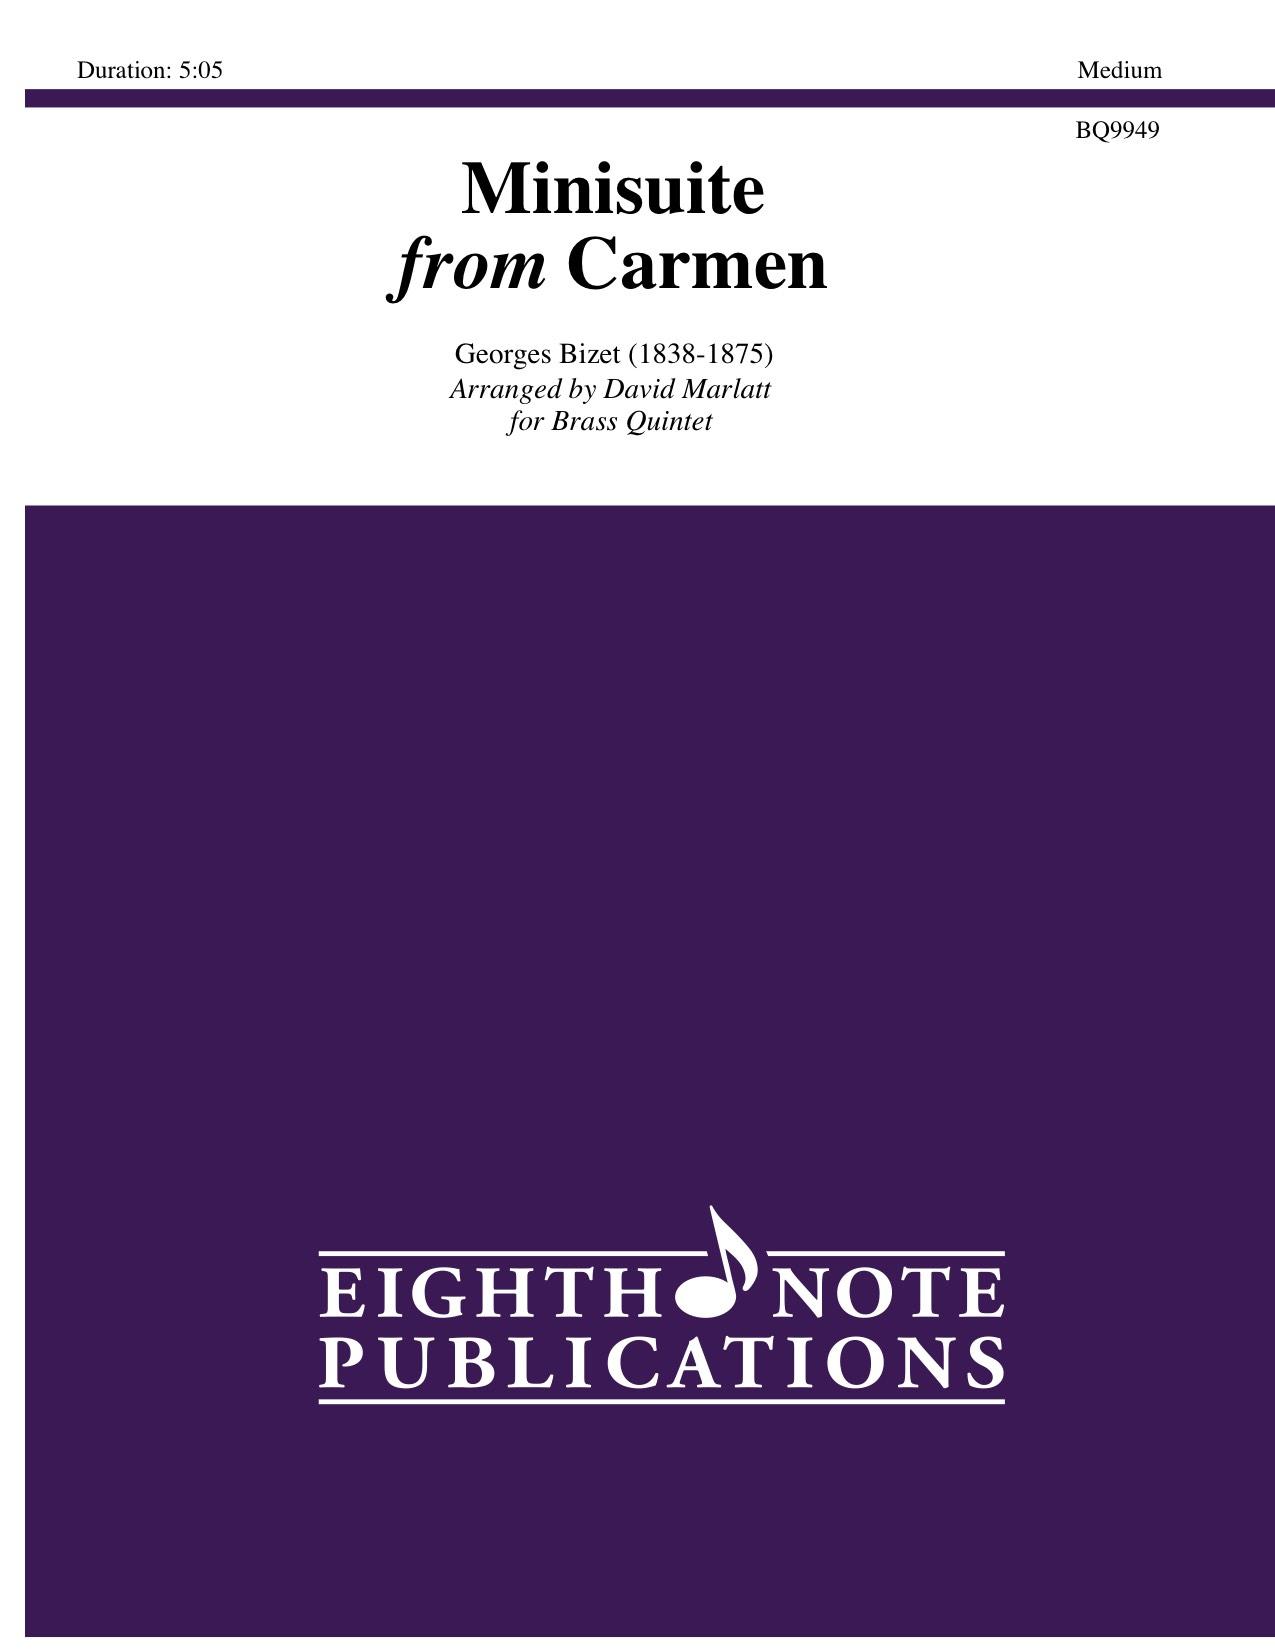 Minisuite from Carmen - Georges Bizet